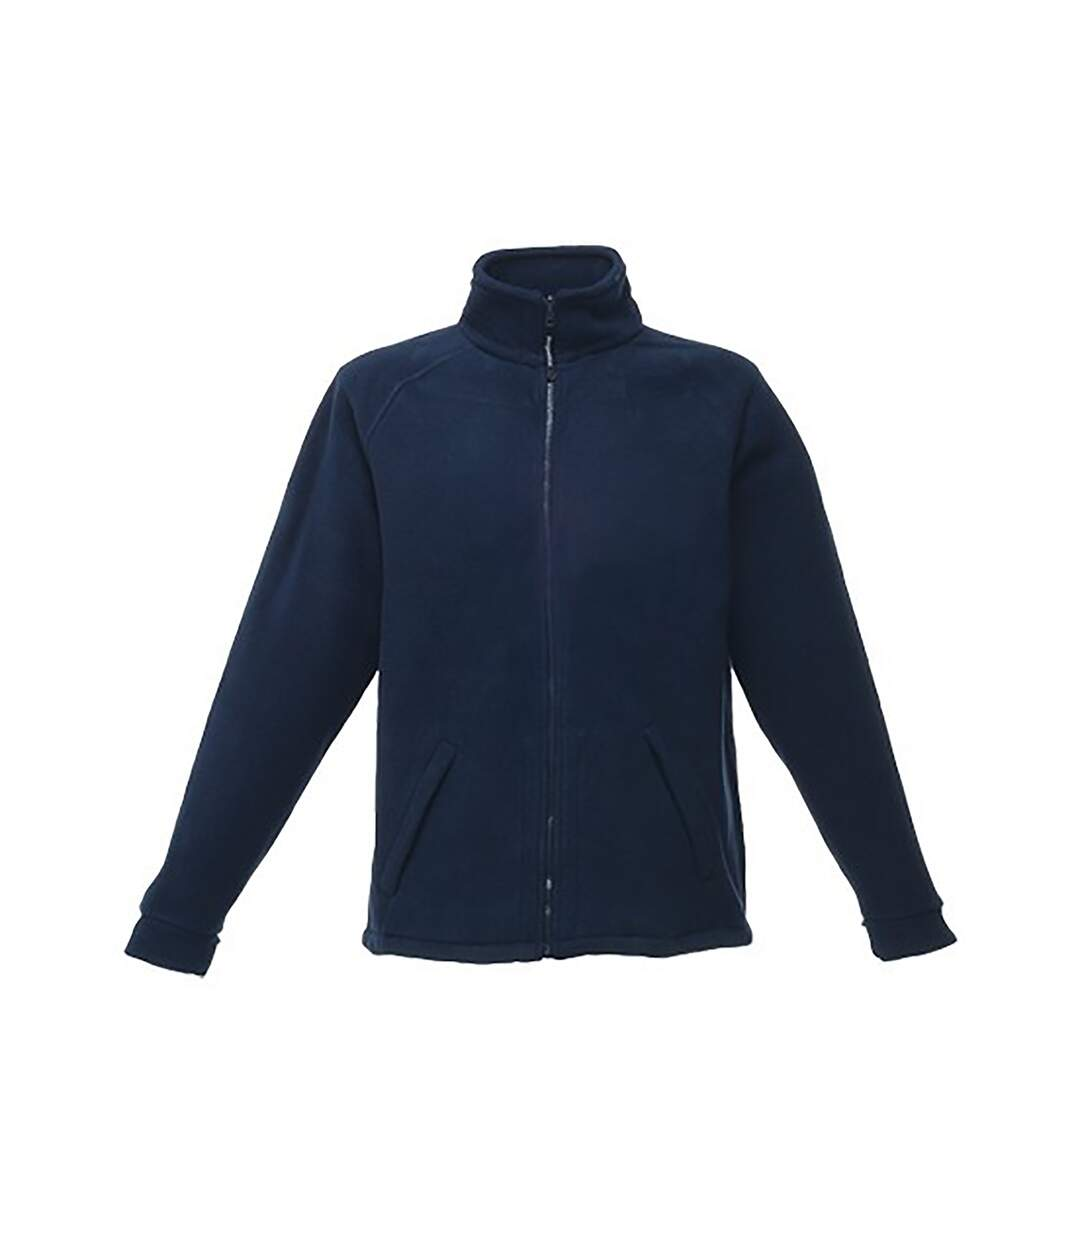 Regatta Great Outdoors Unisex Sigma Symmetry Heavyweight Anti-Pill Fleece Zip Up Jacket (380 GSM) (Dark Navy) - UTRG1843